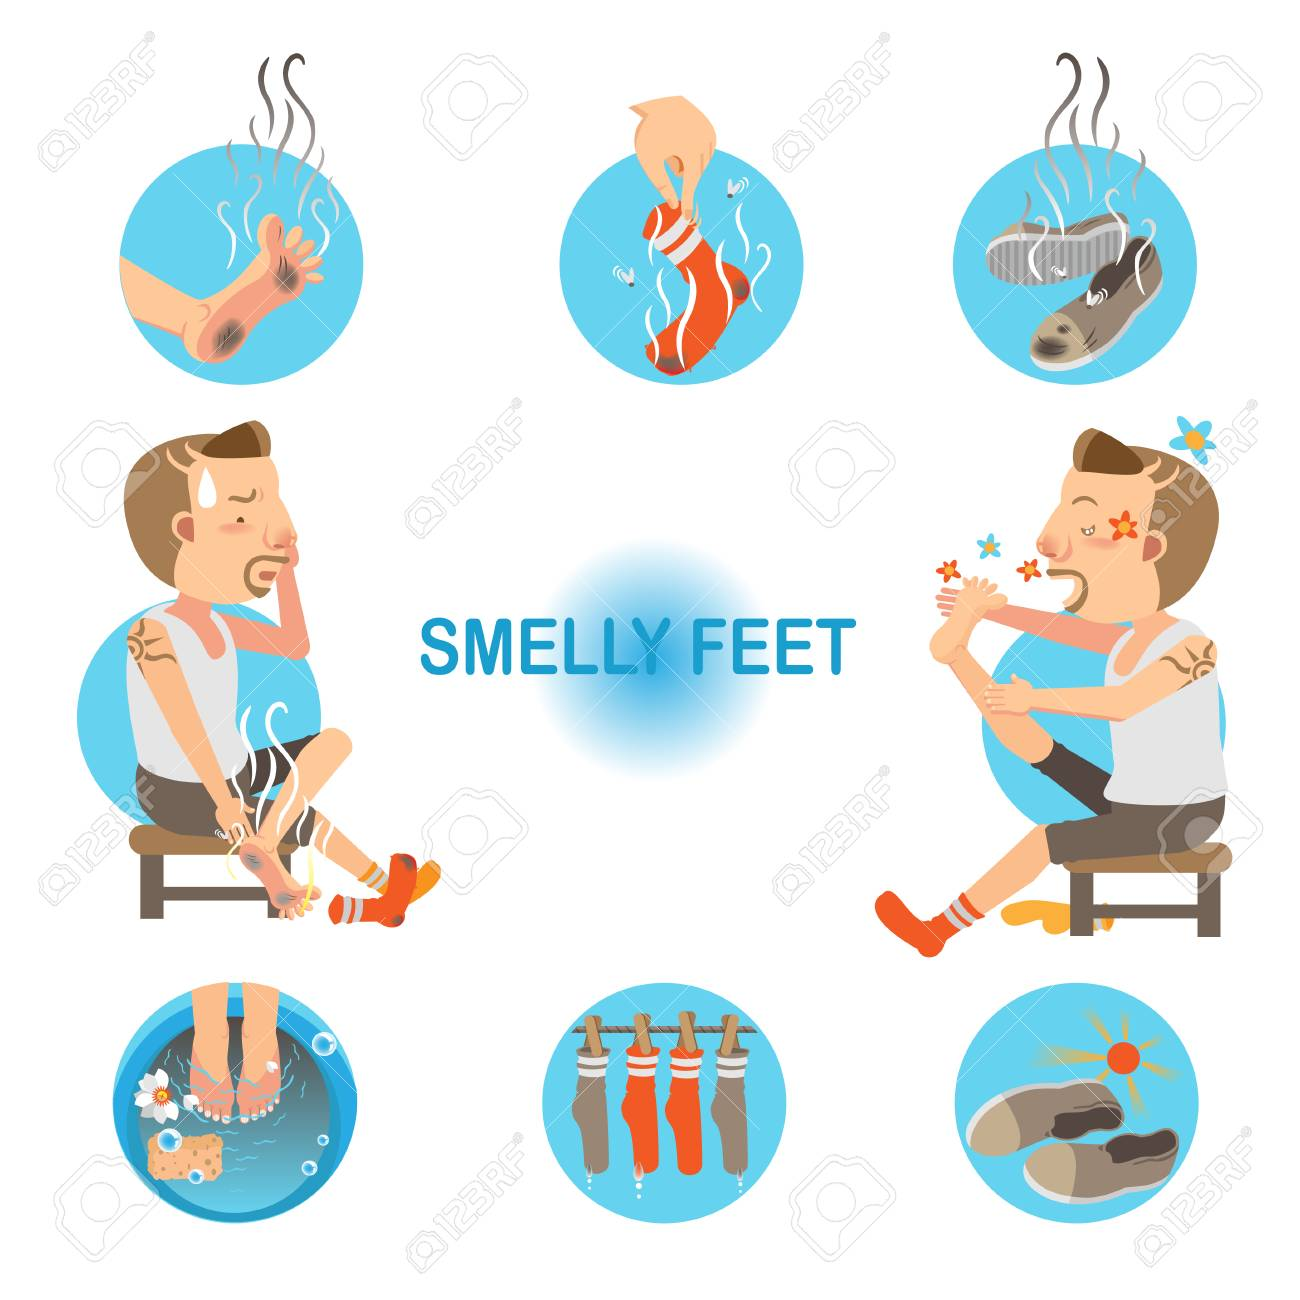 Cartoon man unpleasant odor of socks and sneakers on his feet. Vector illustration - 93128731